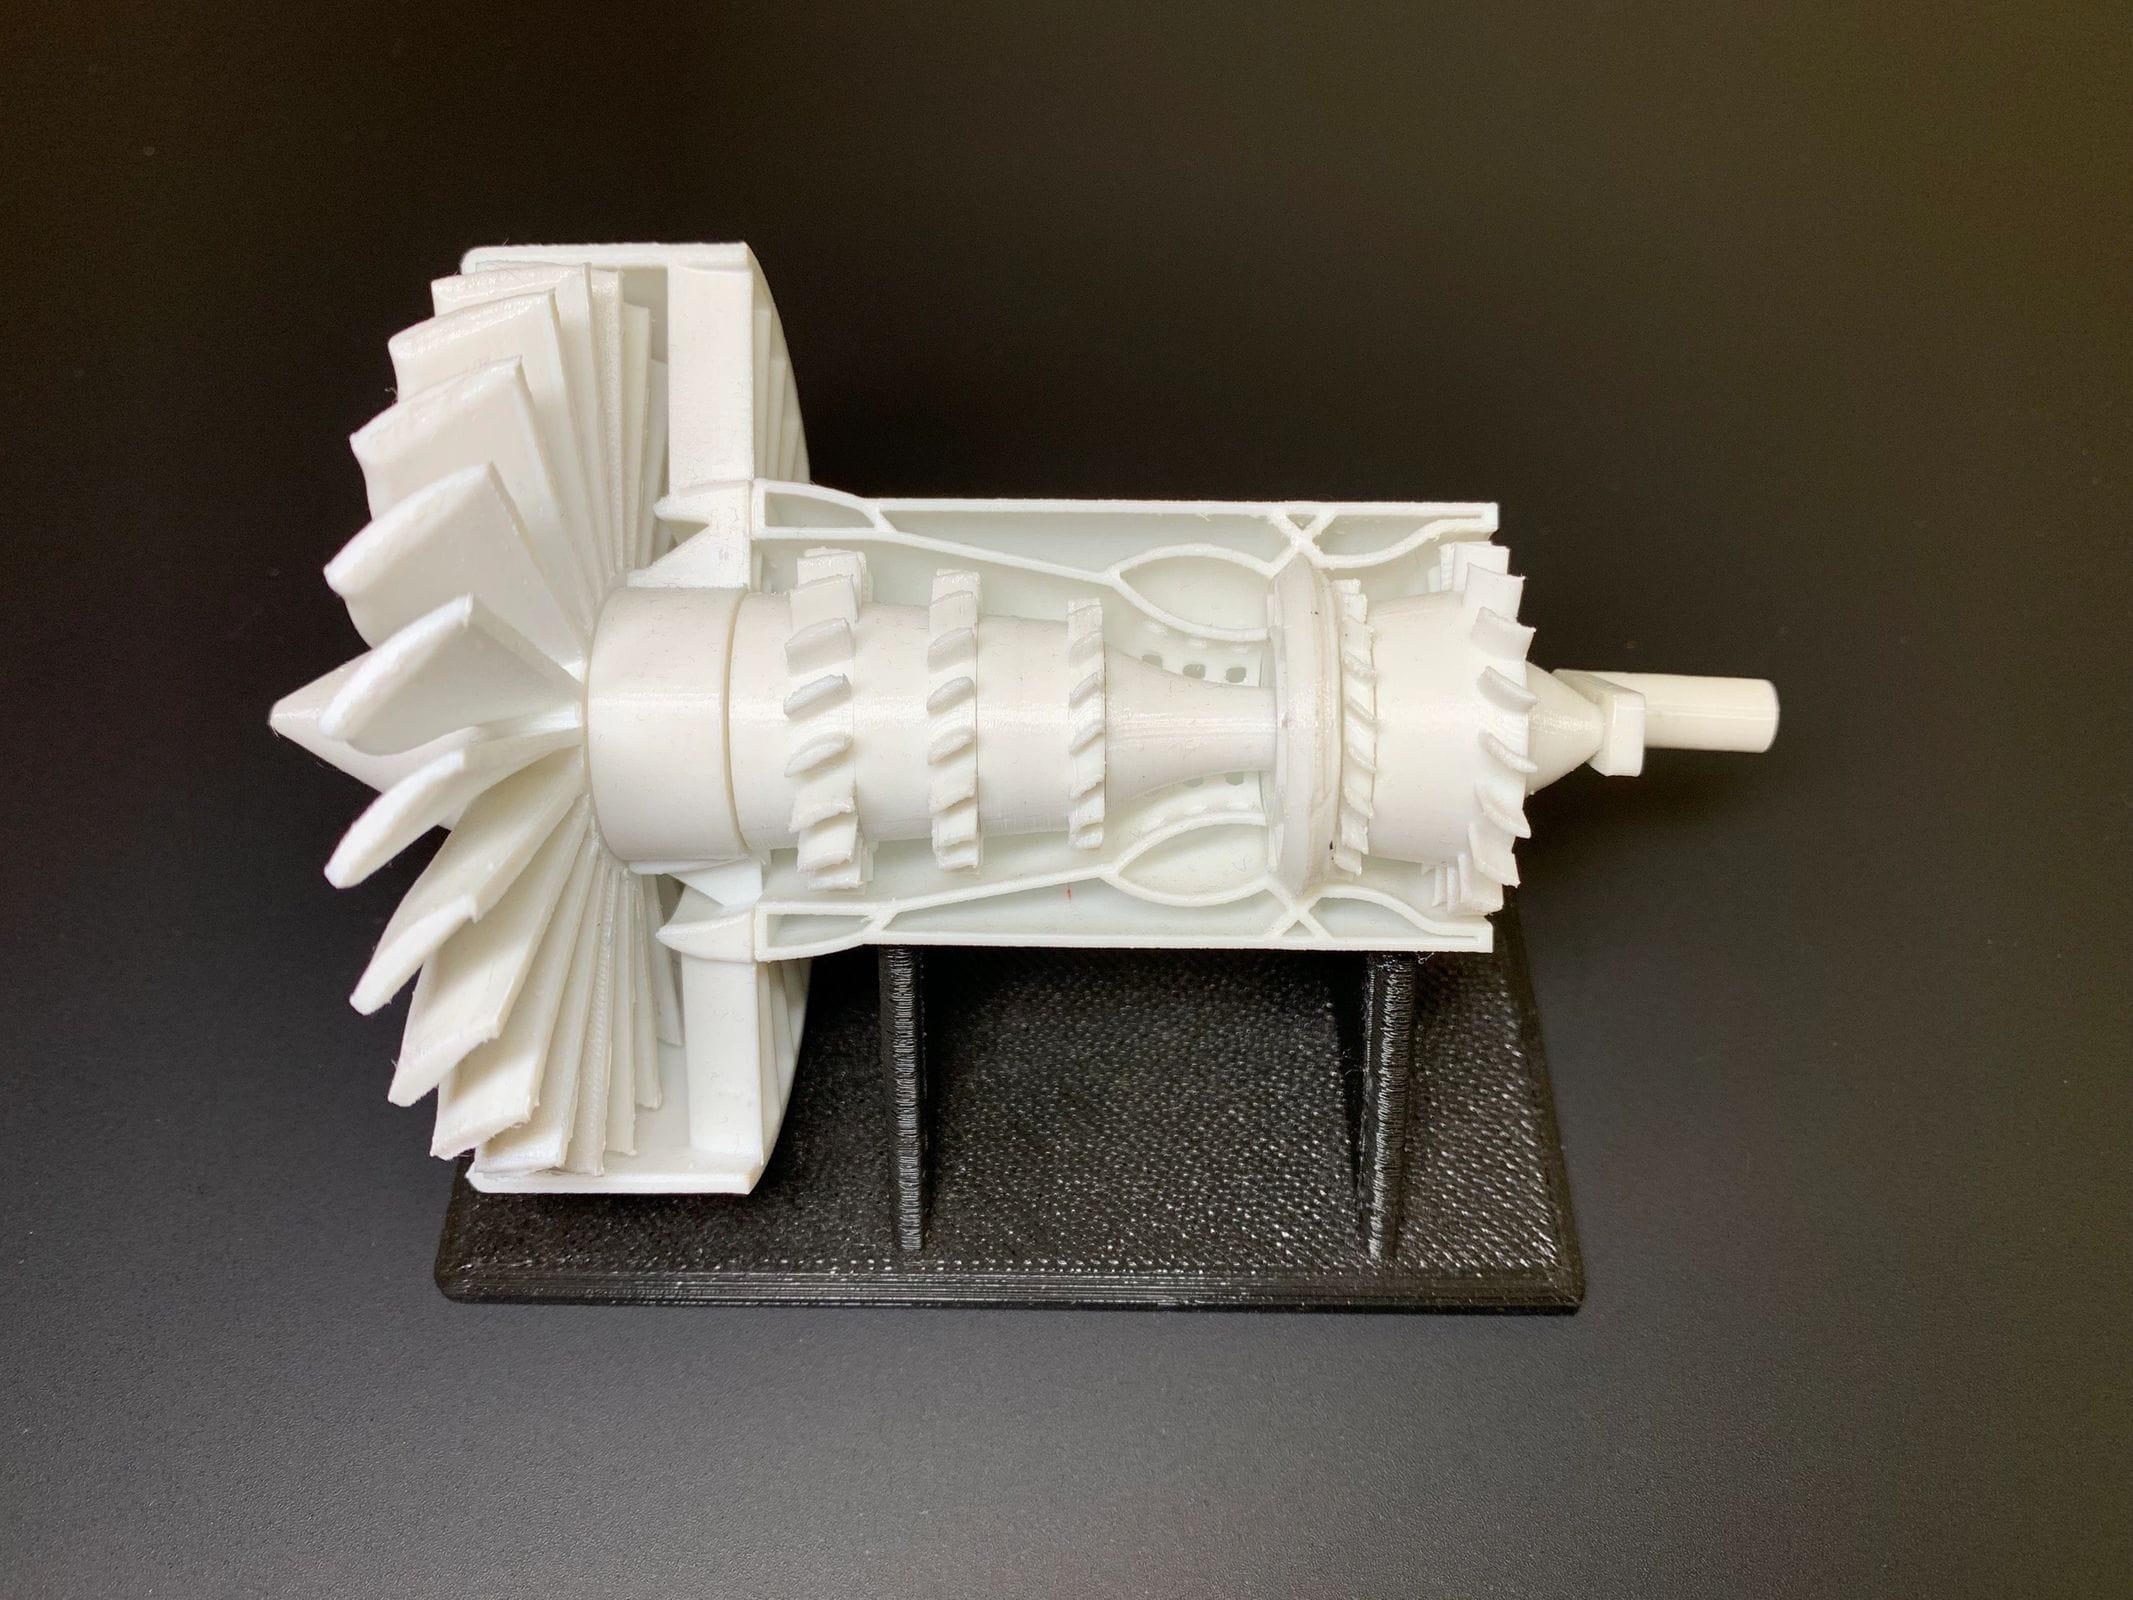 GE Turbofan Assembly - FDM Printed